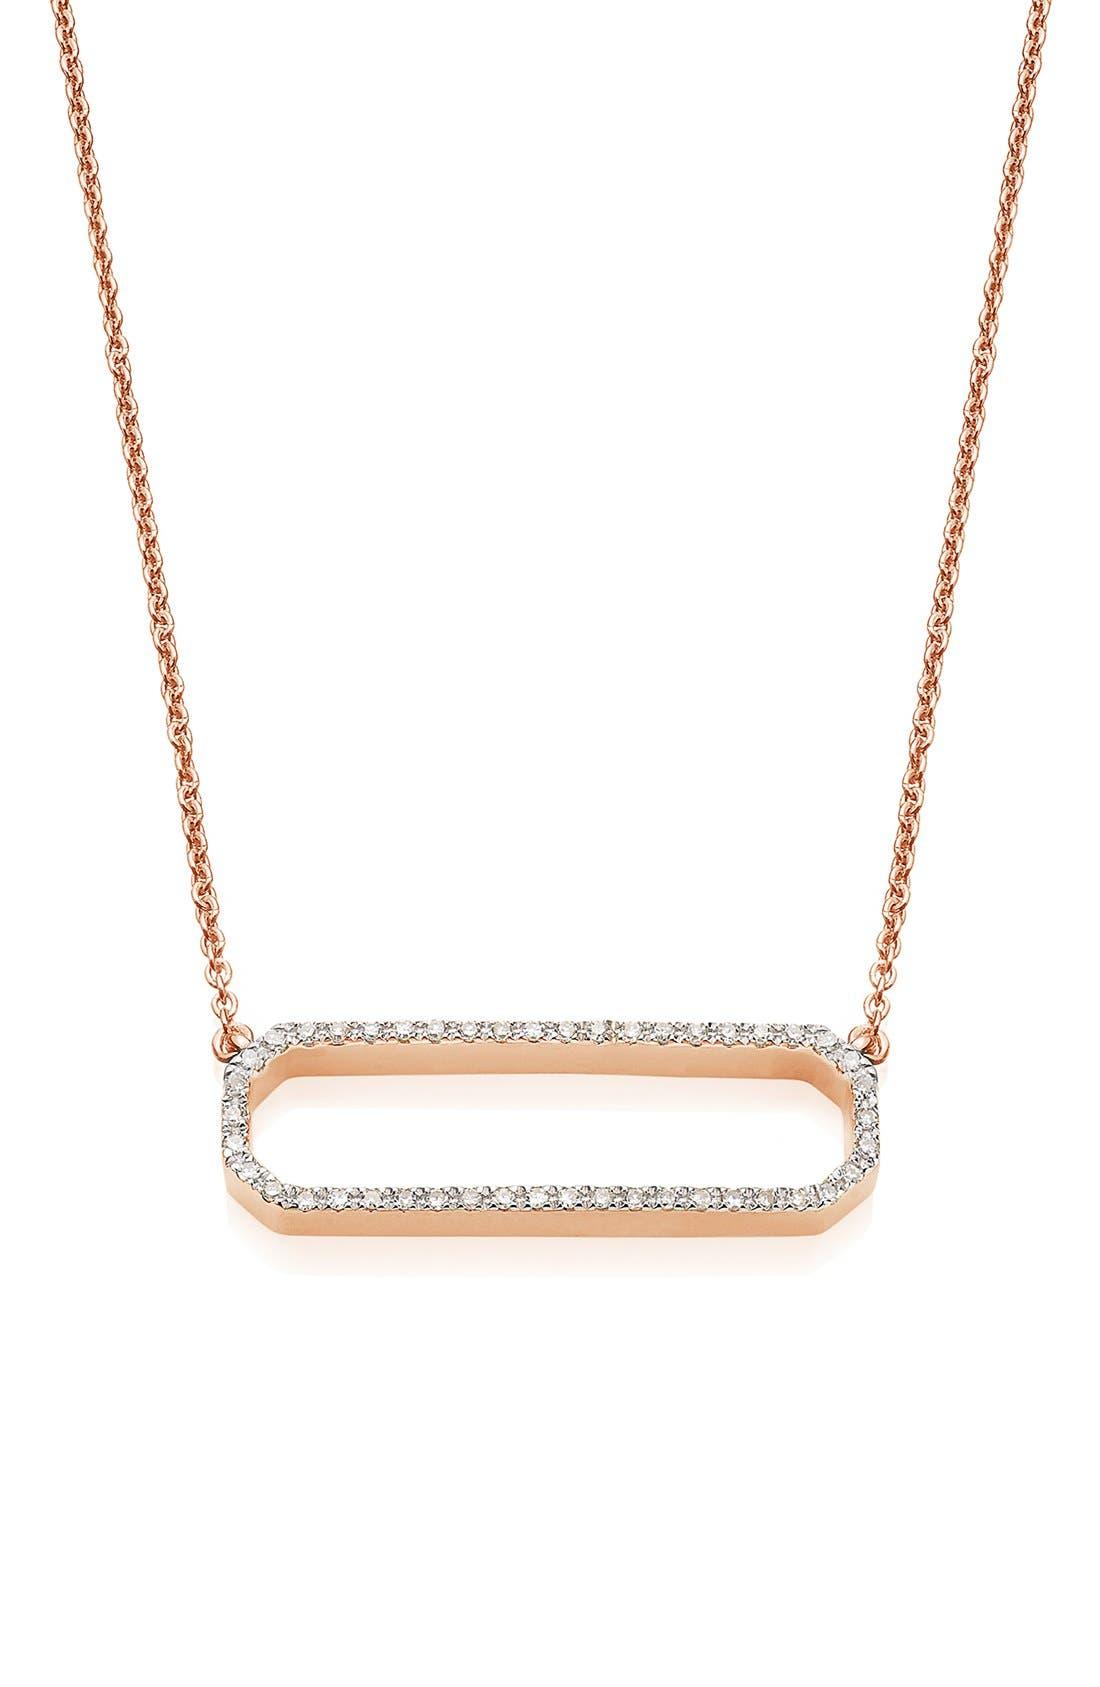 Main Image - Monica Vinader 'Naida' Open Rectangle Diamond Pendant Necklace